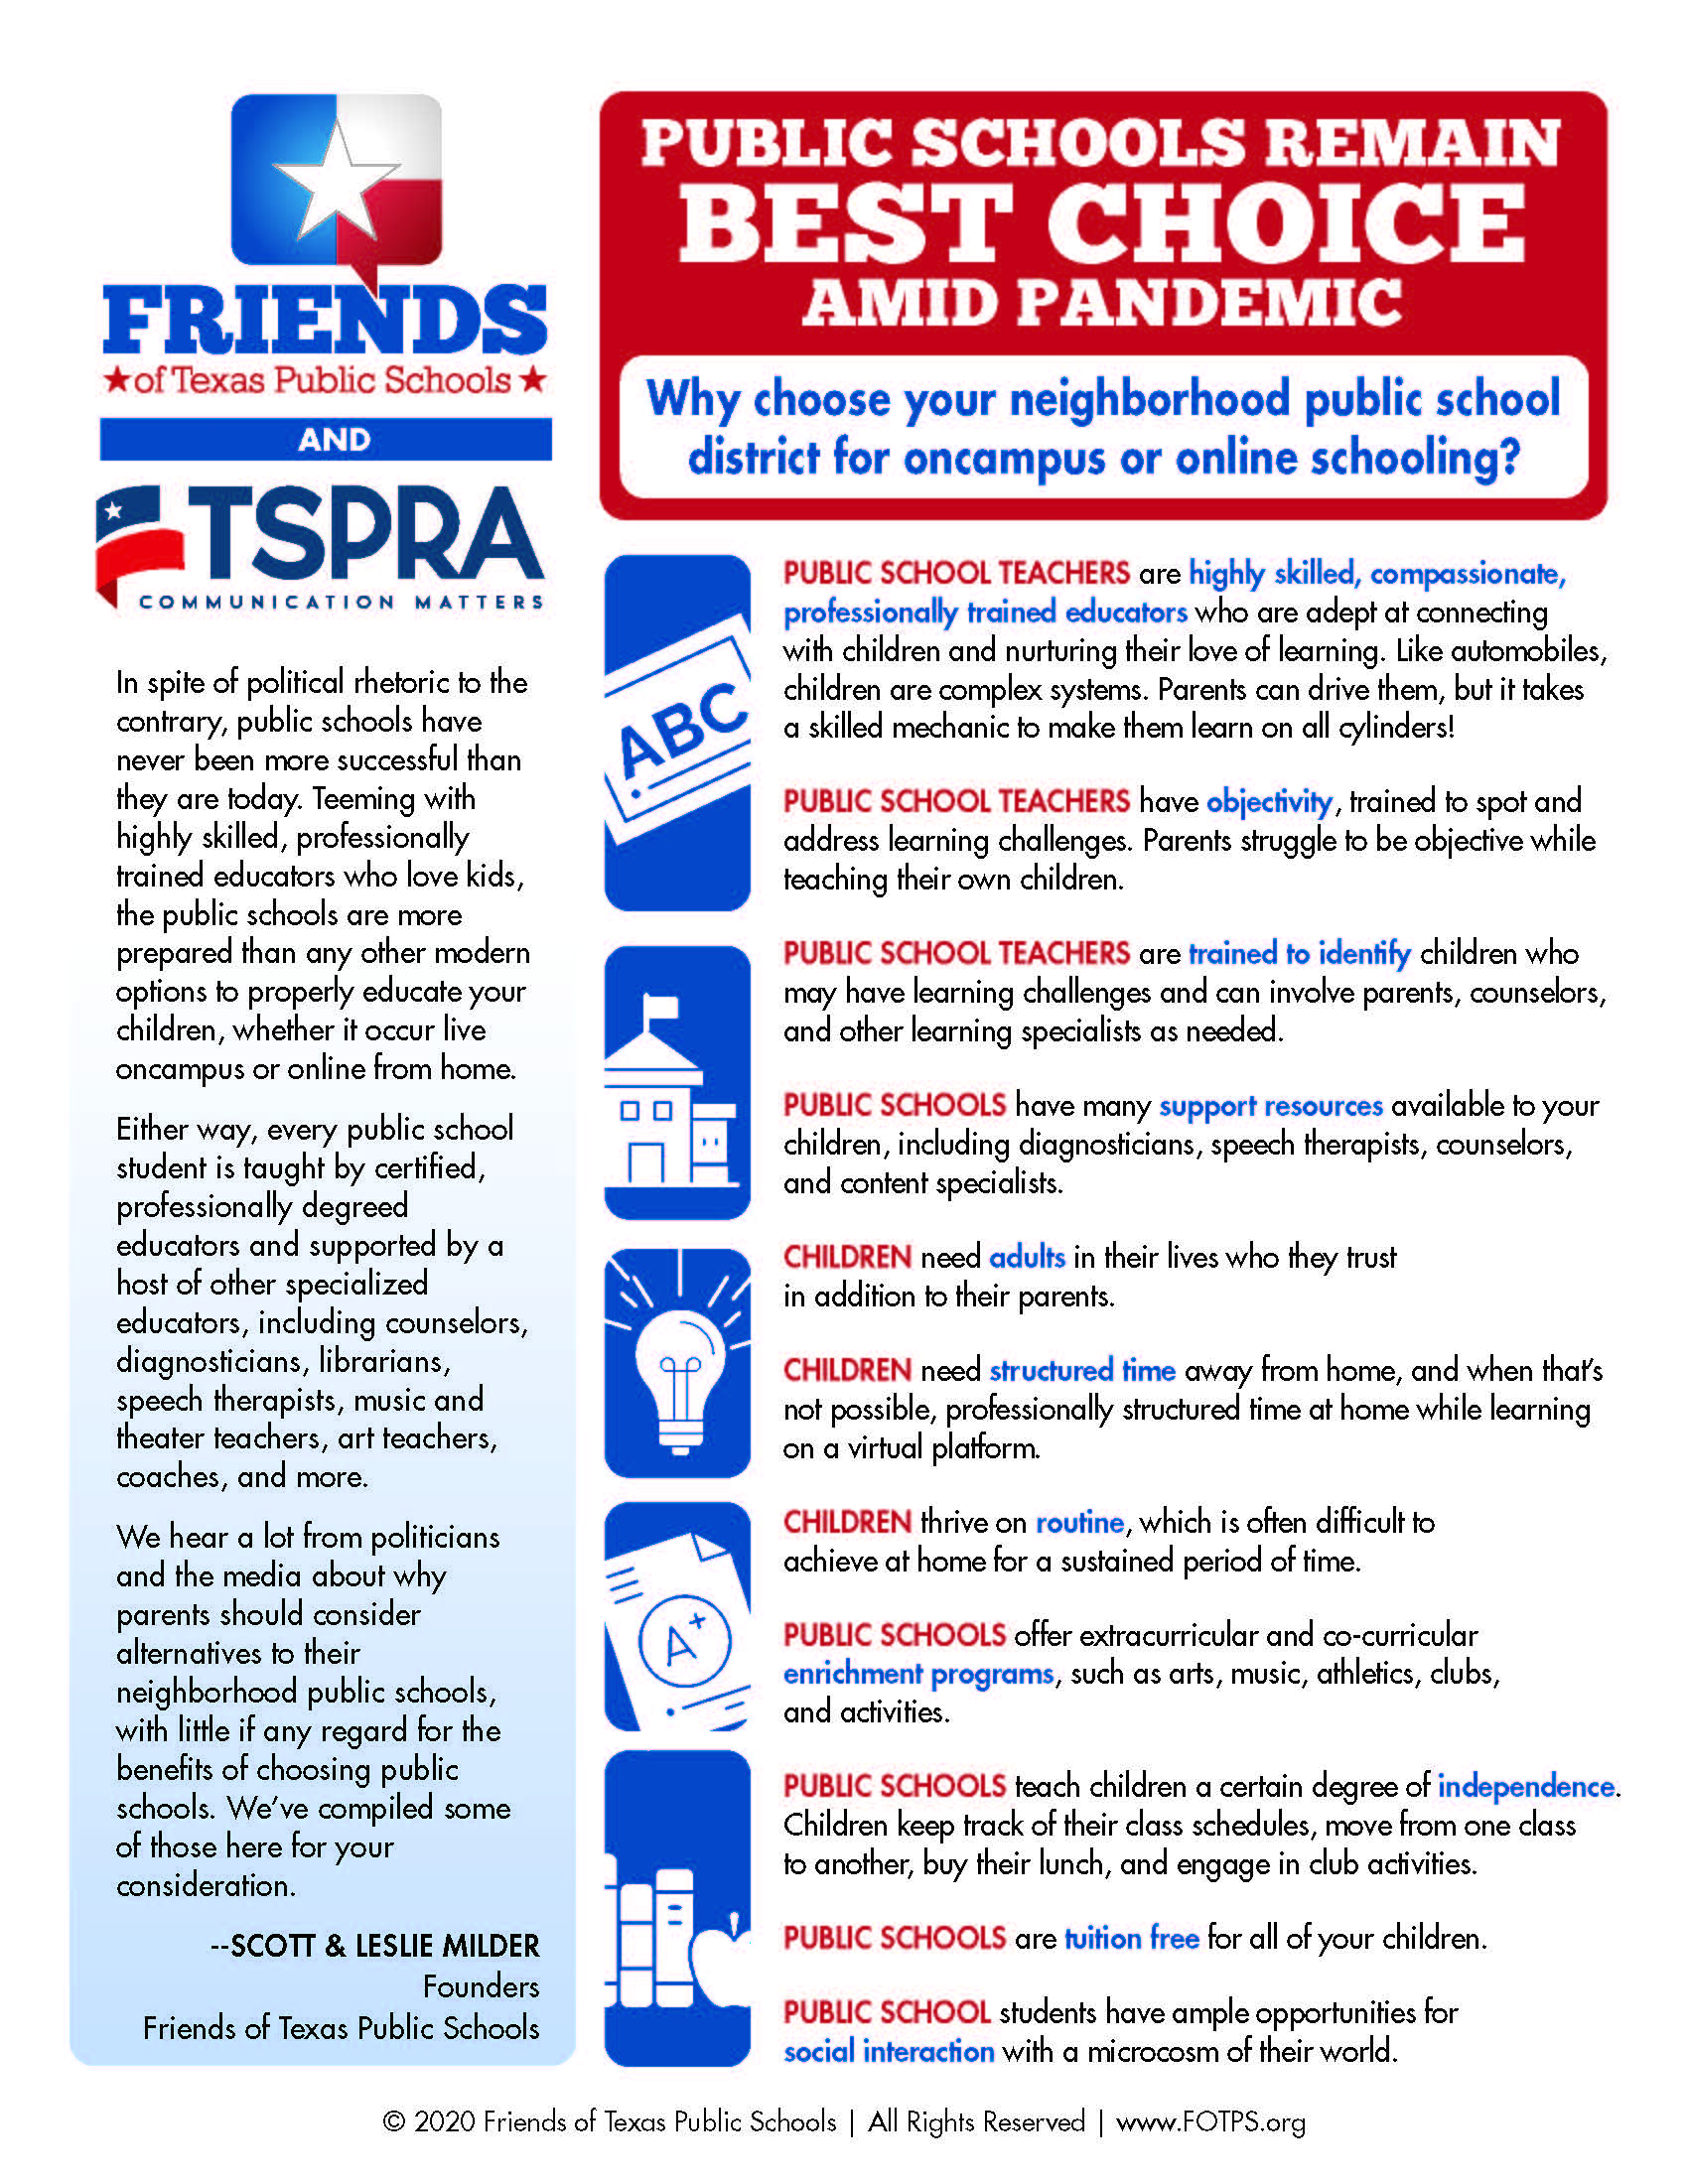 TSPRA Texas Public School Talking Points